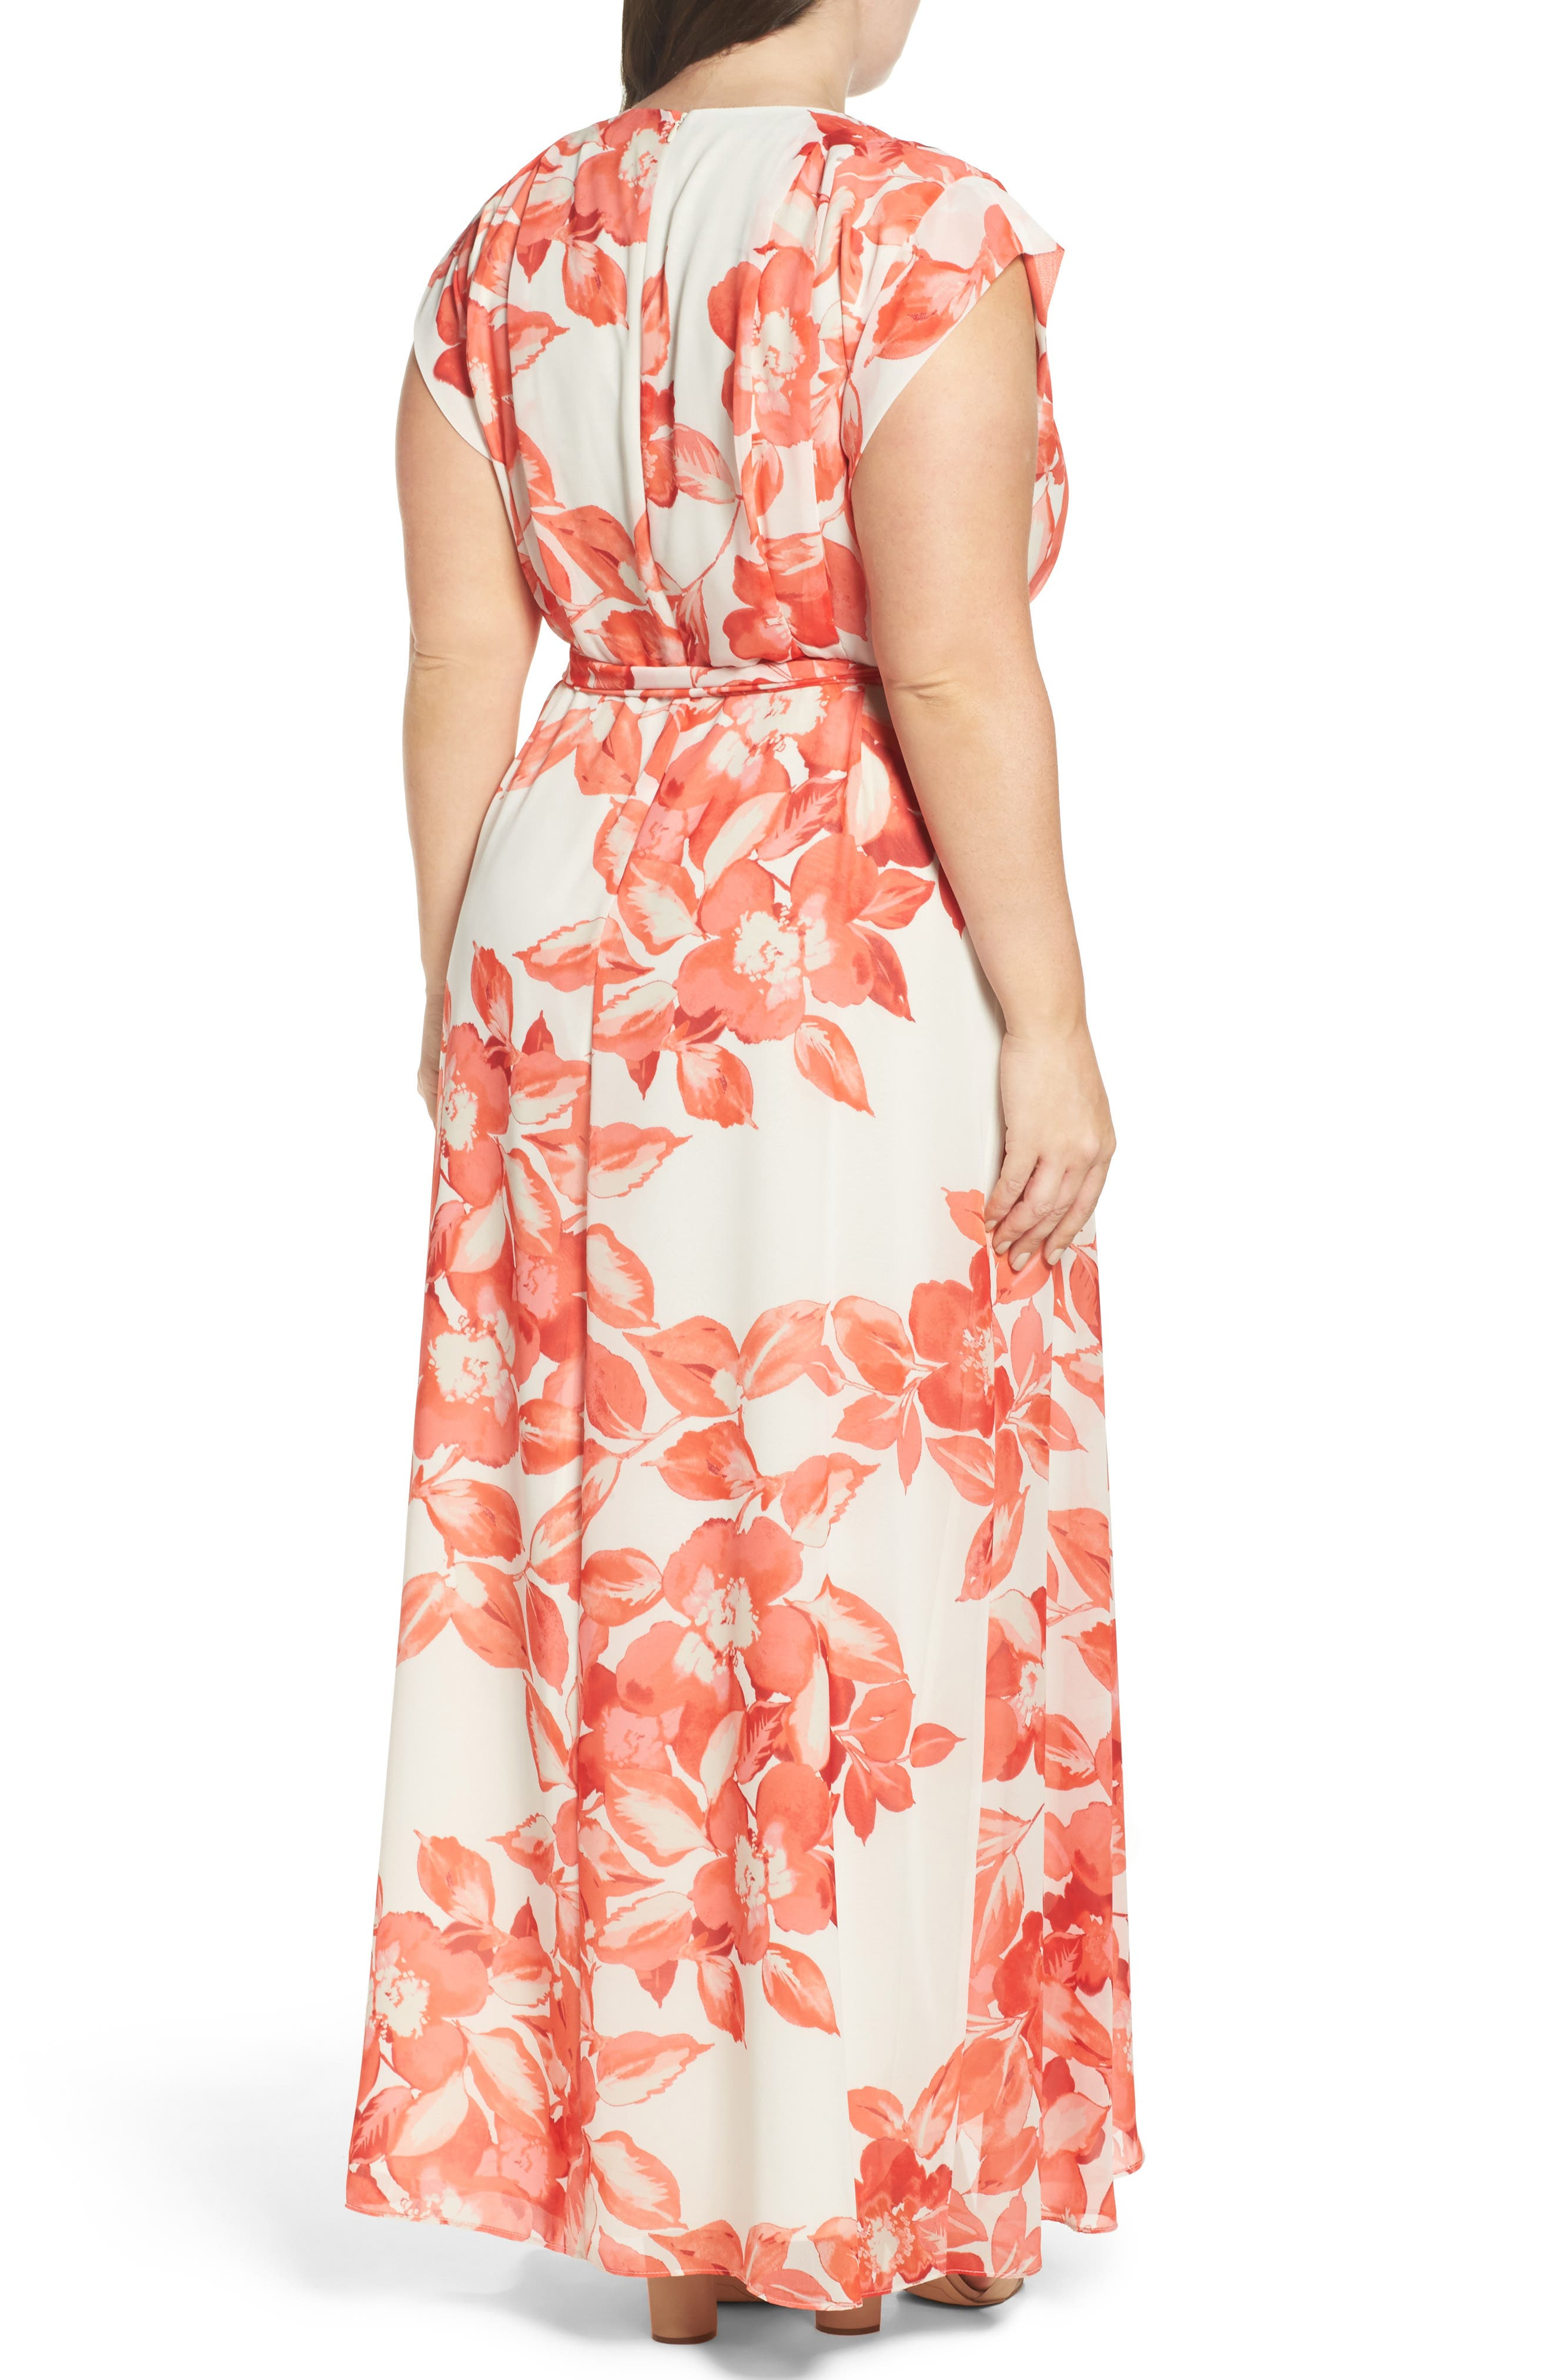 ELIZA J, Floral Chiffon High/Low Maxi Dress, Alternate thumbnail 2, color, 958